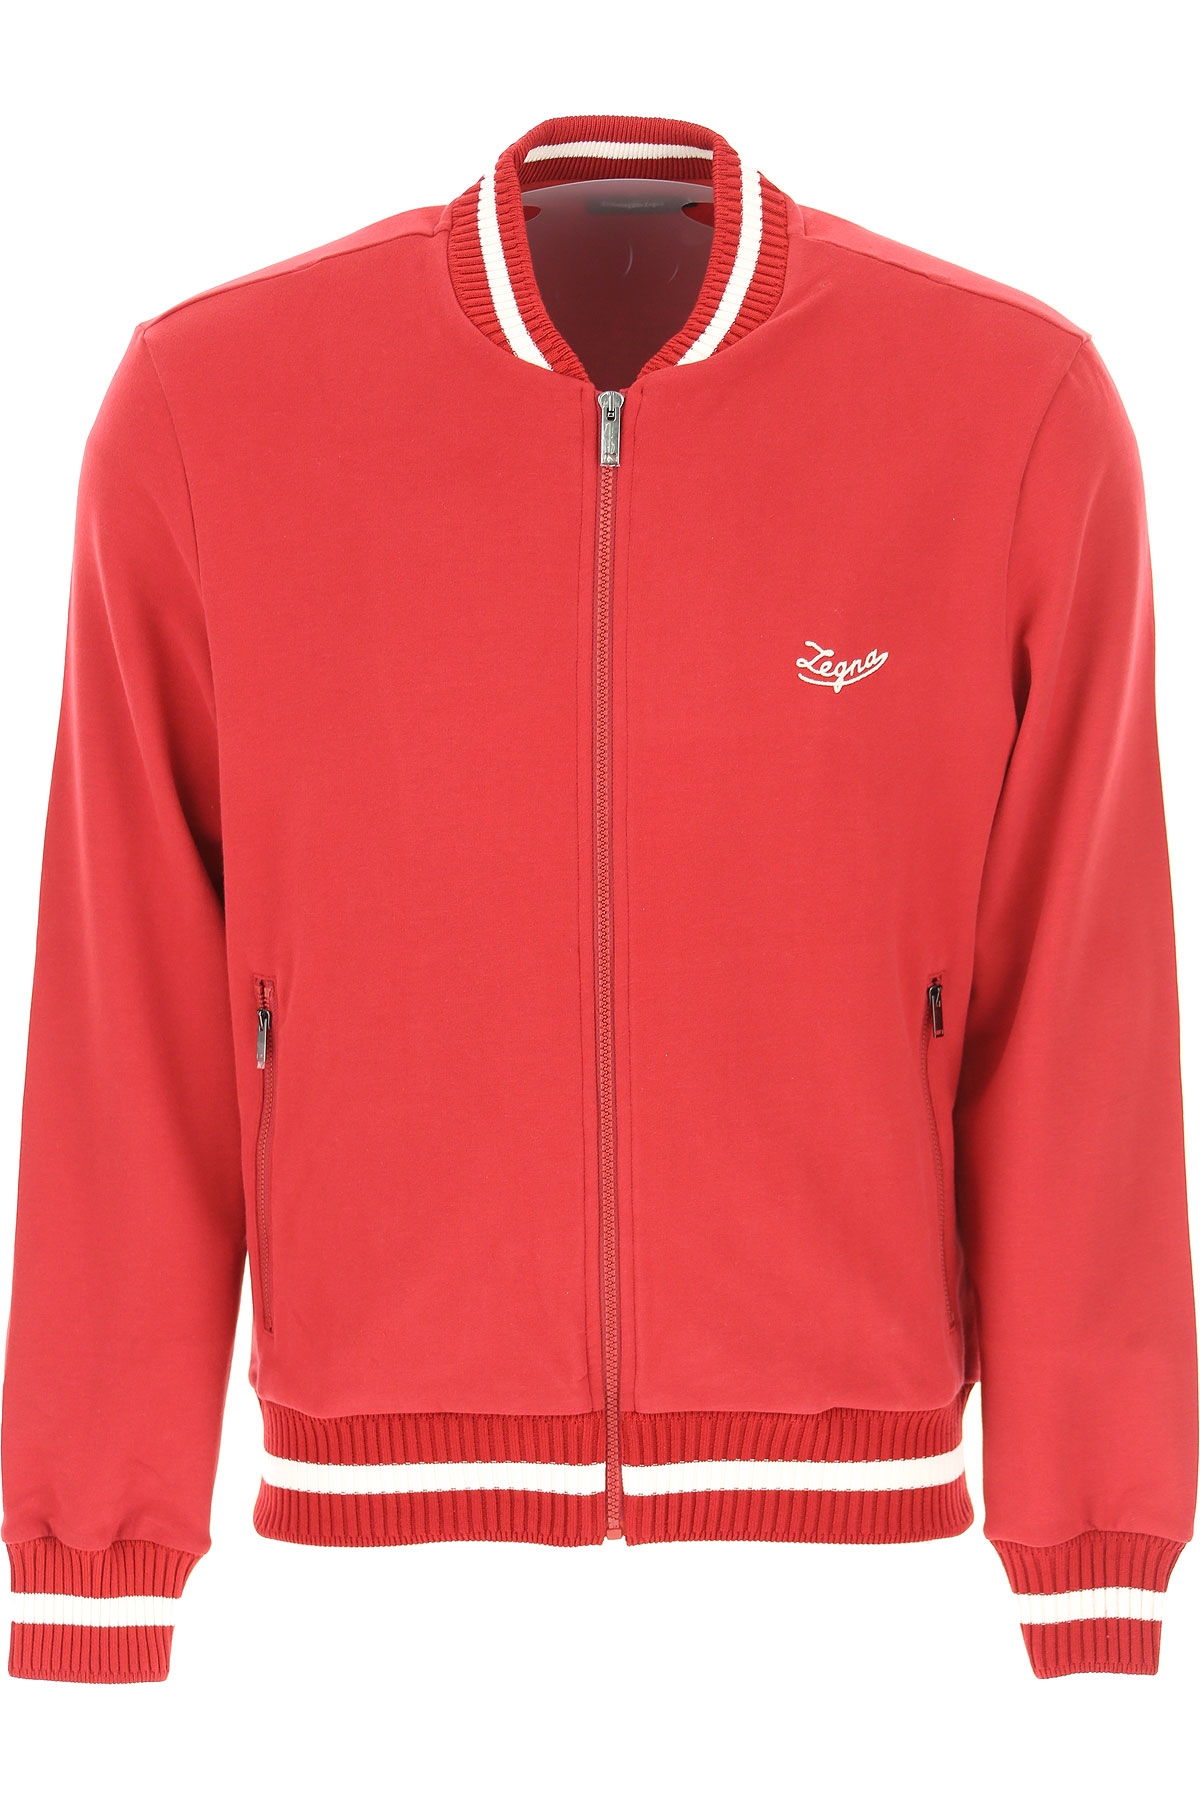 Ermenegildo Zegna Sweatshirt for Men, Red, Cotton, 2017, L M S XL USA-470924